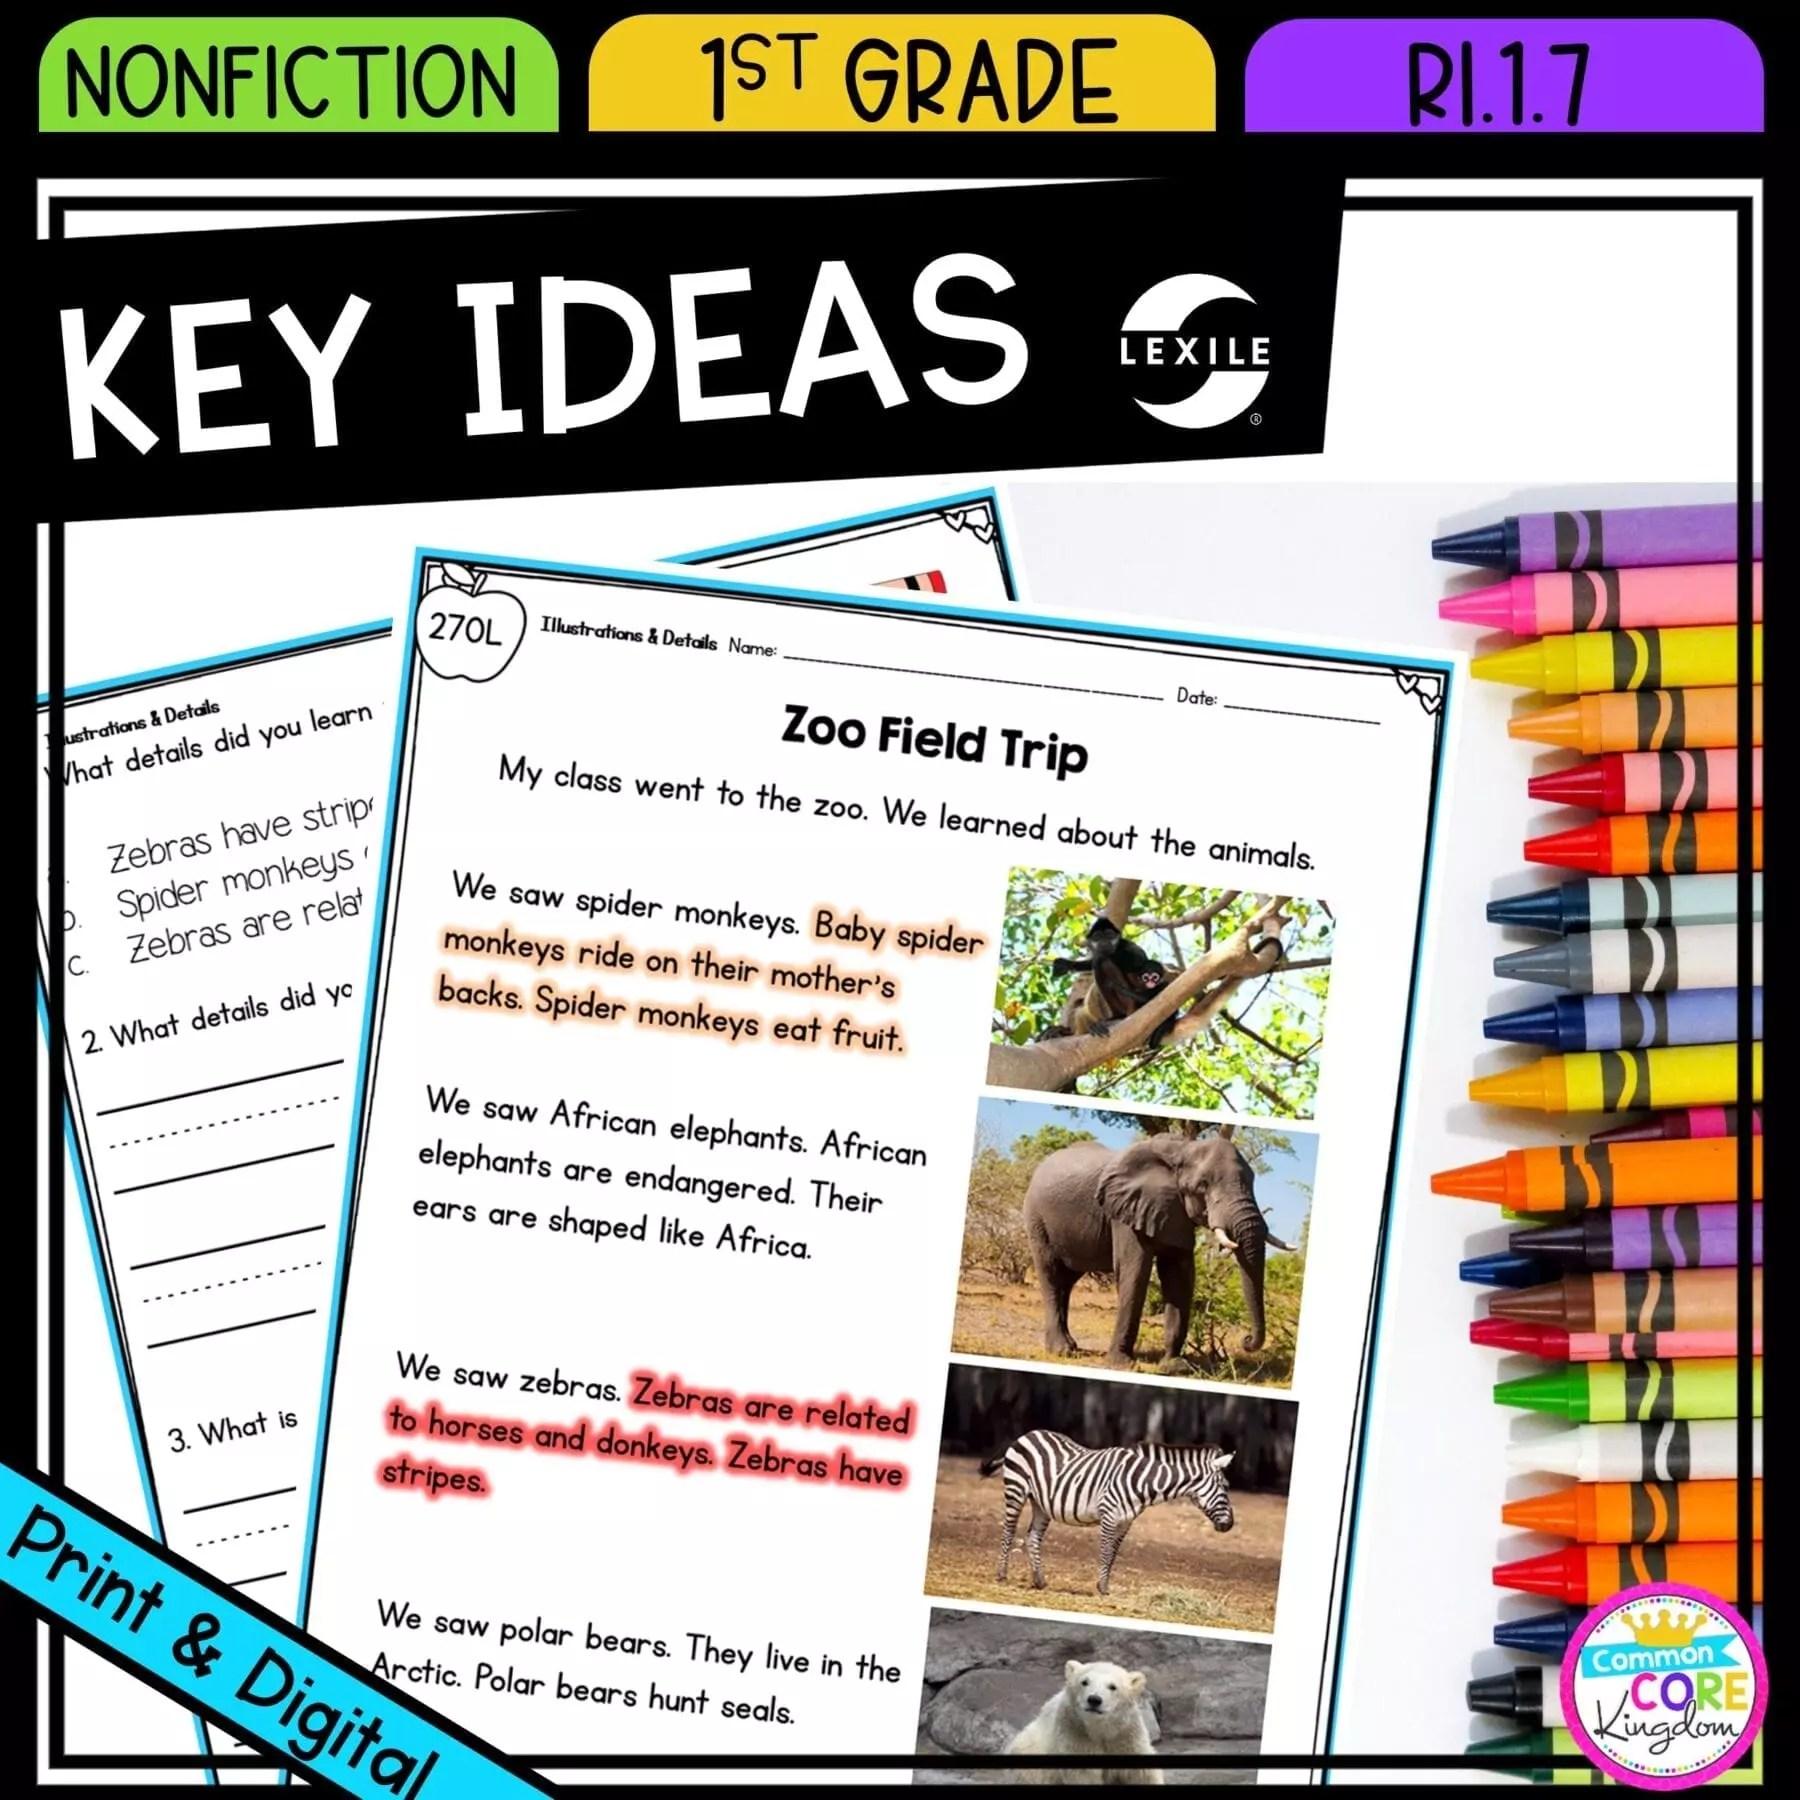 Illustrations \u0026 Key Ideas - 1st Grade RI.1.7 Printable \u0026 Digital Google  Slides Distance Learning   Common Core Kingdom [ 1800 x 1800 Pixel ]